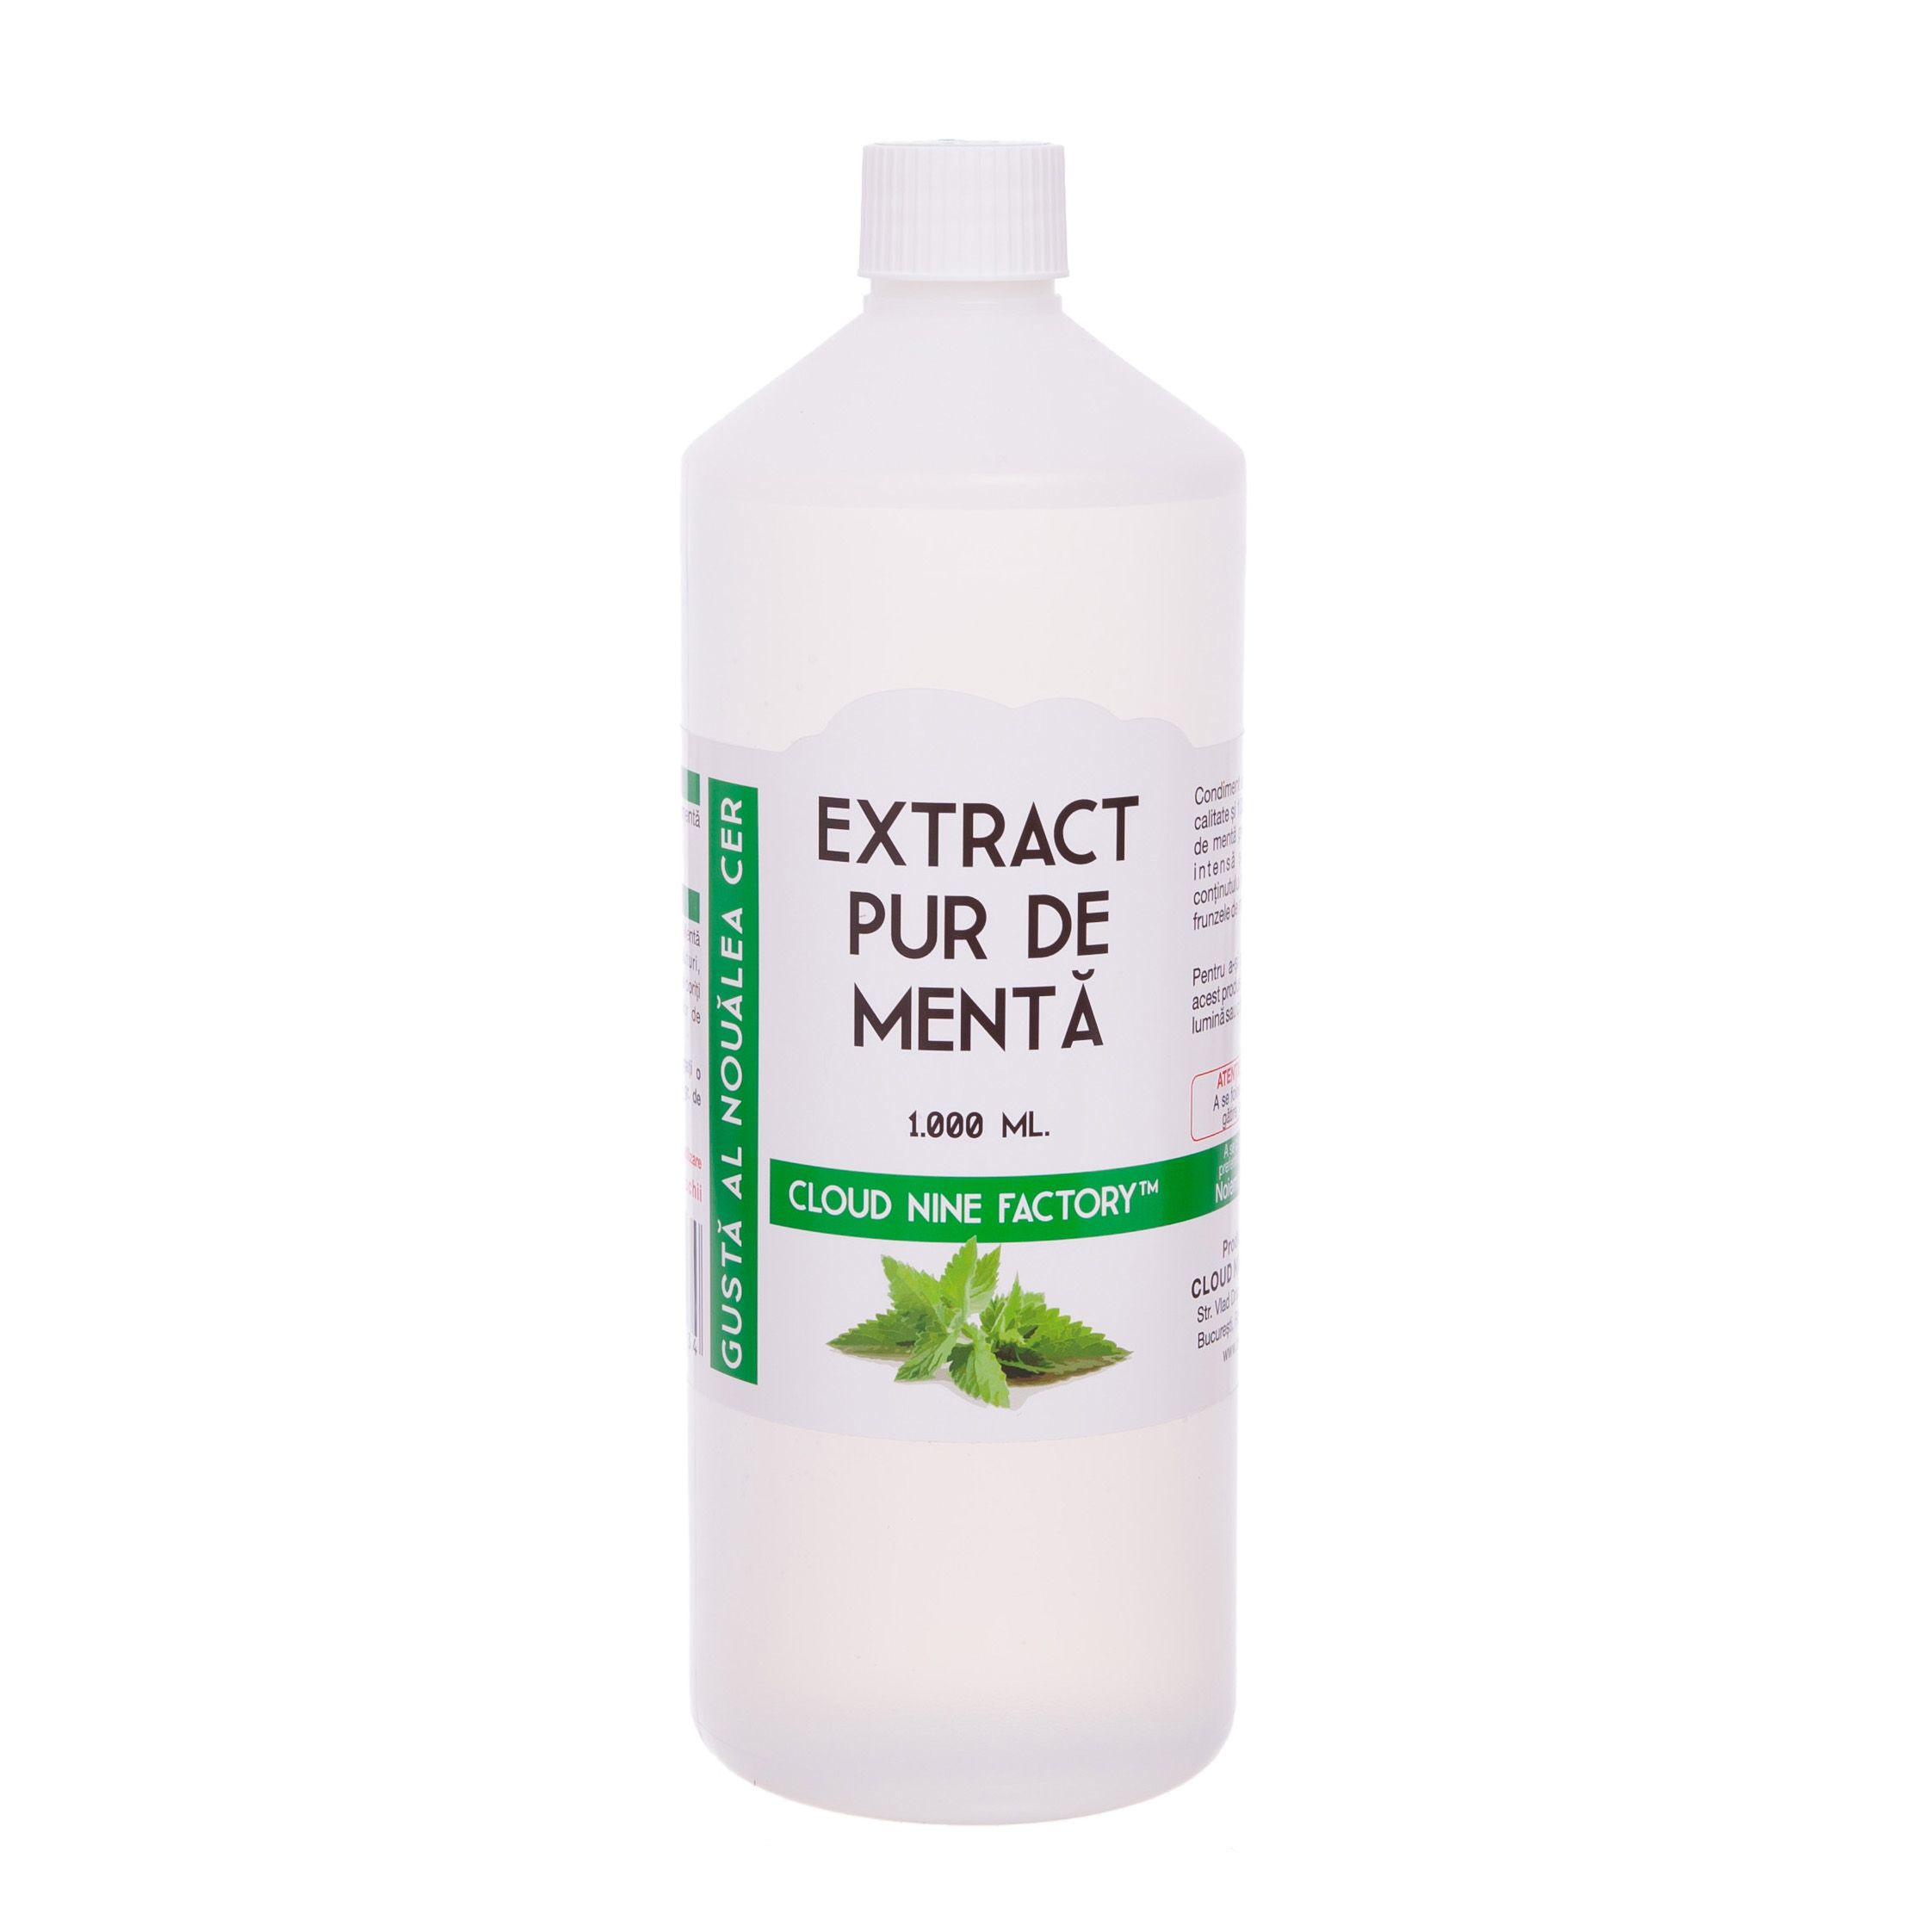 Extract Pur de Mentă (1.000 ml.) extract pur de mentă (1.000 ml.) - IMG 2659 - Extract Pur de Mentă (1.000 ml.) Extract Pur de Mentă - IMG 2659 - Extract Pur de Mentă